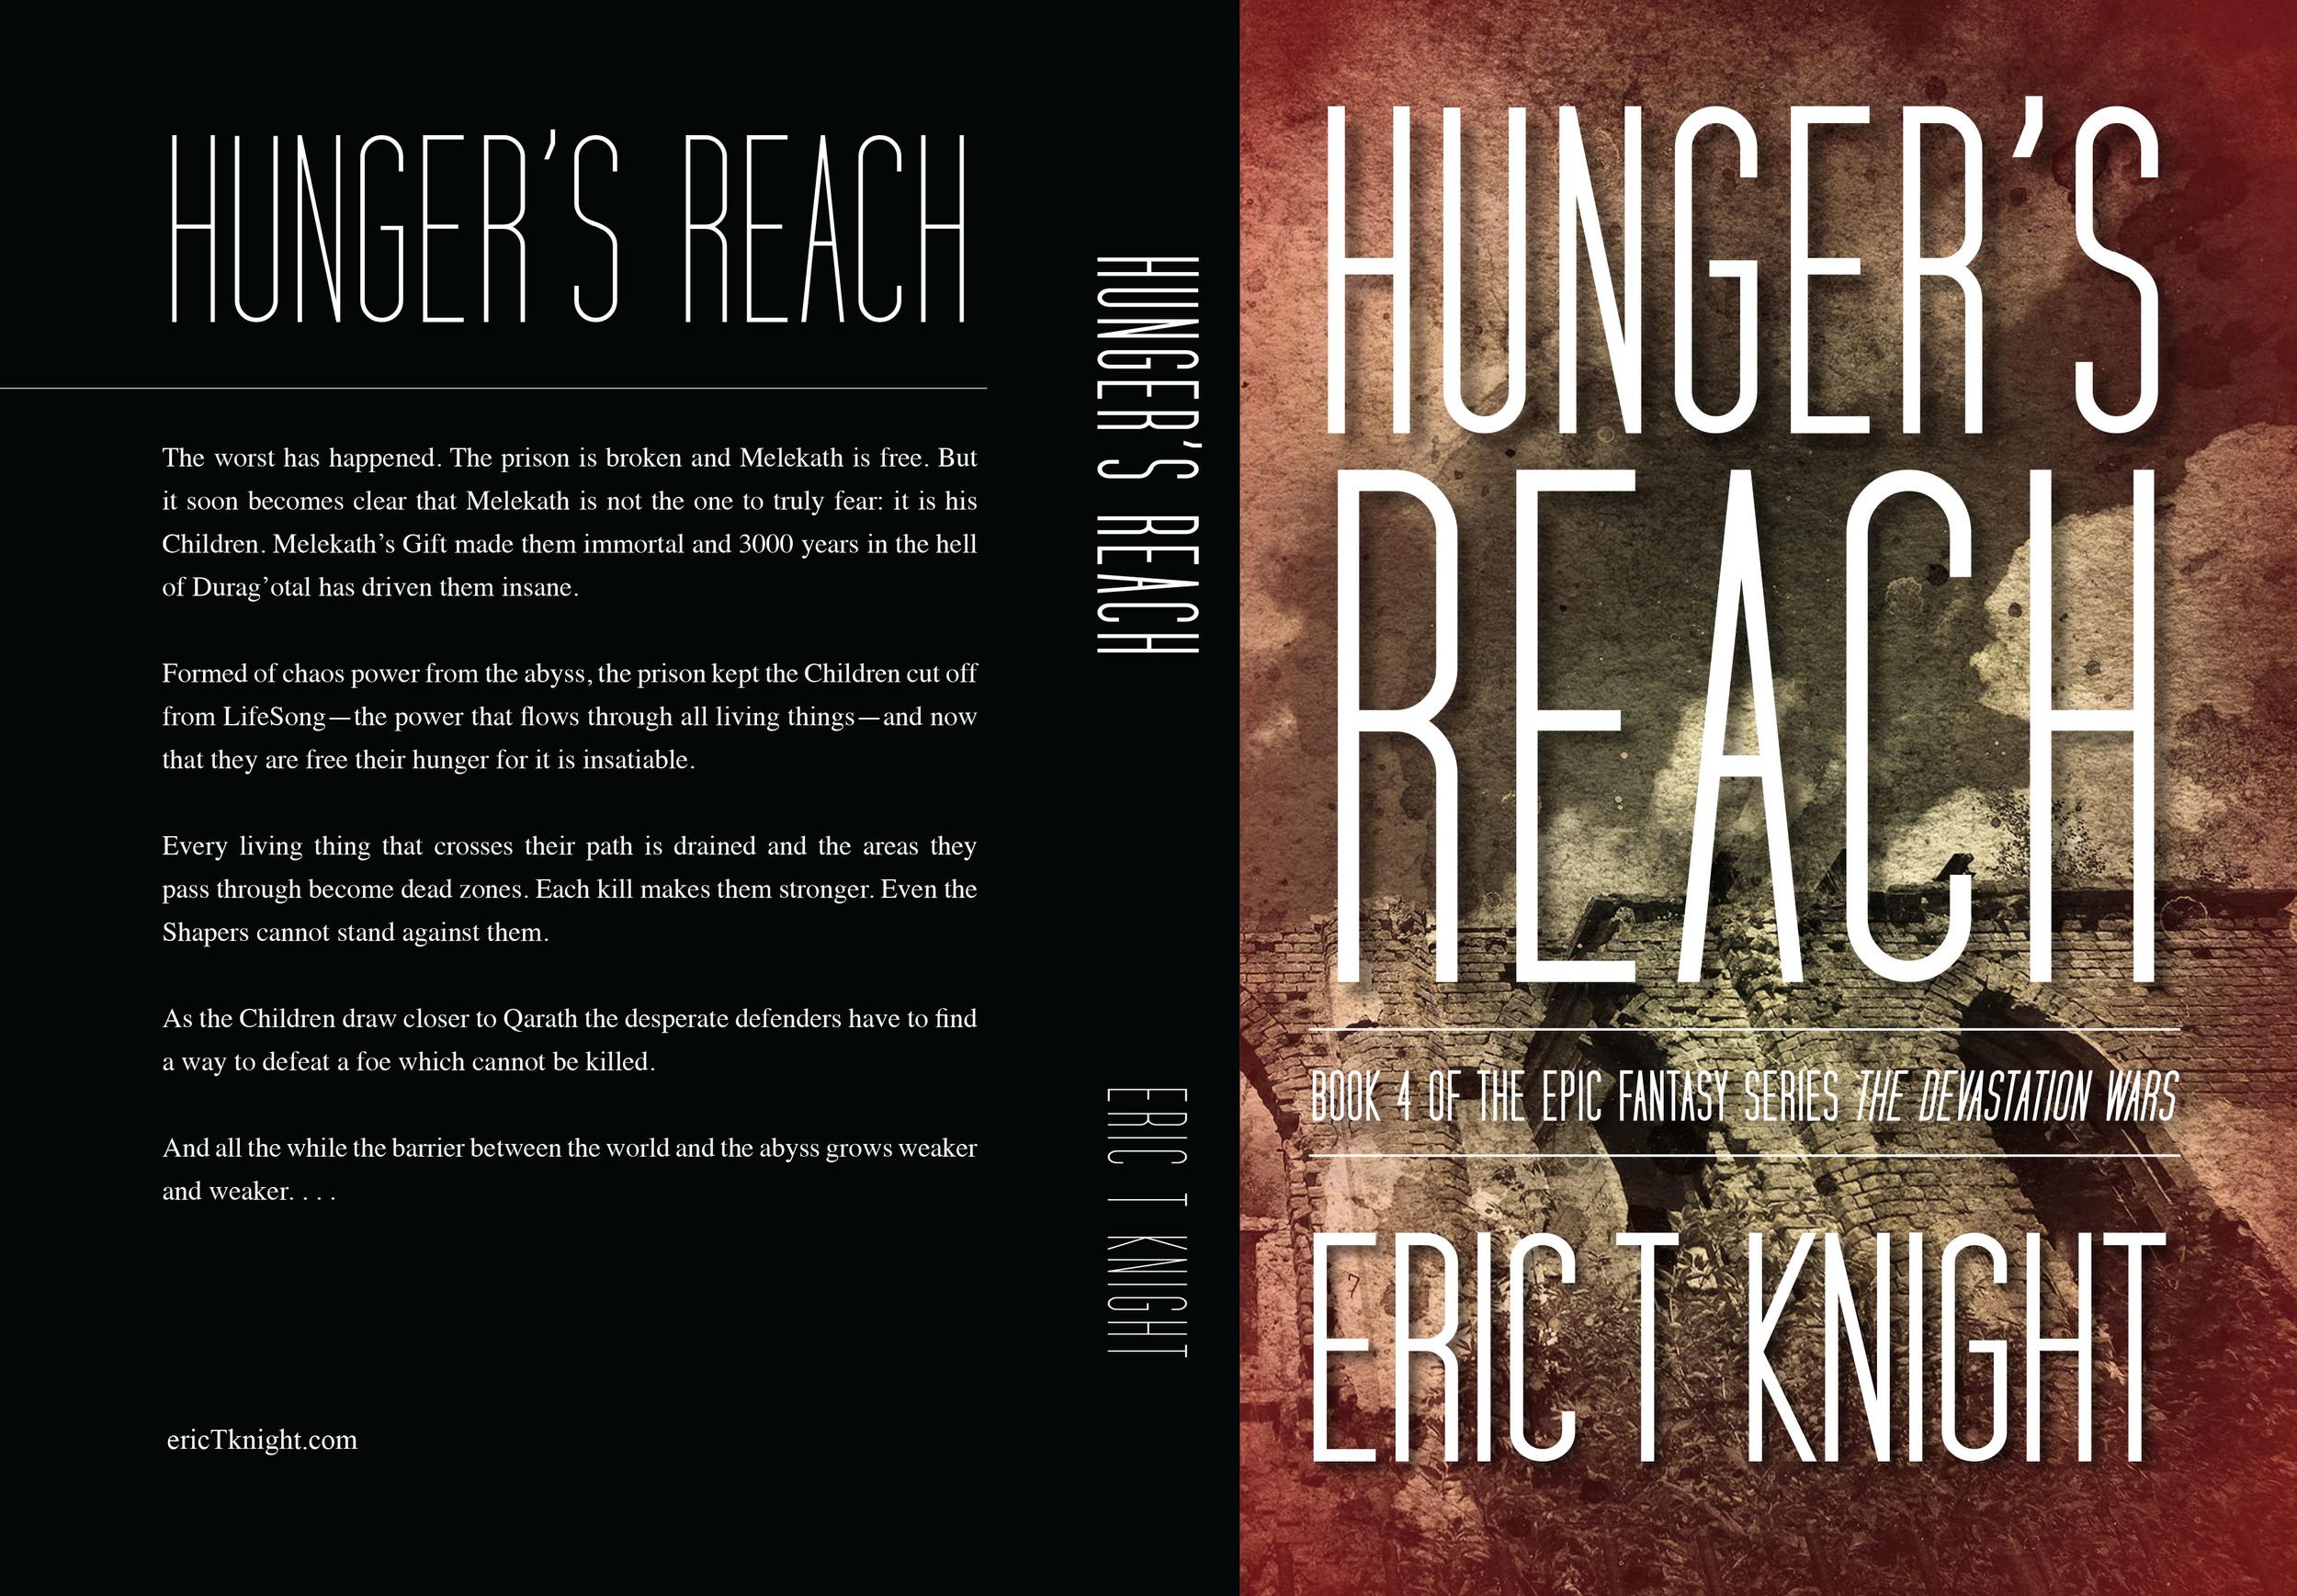 HungersReach_Mock1.jpg